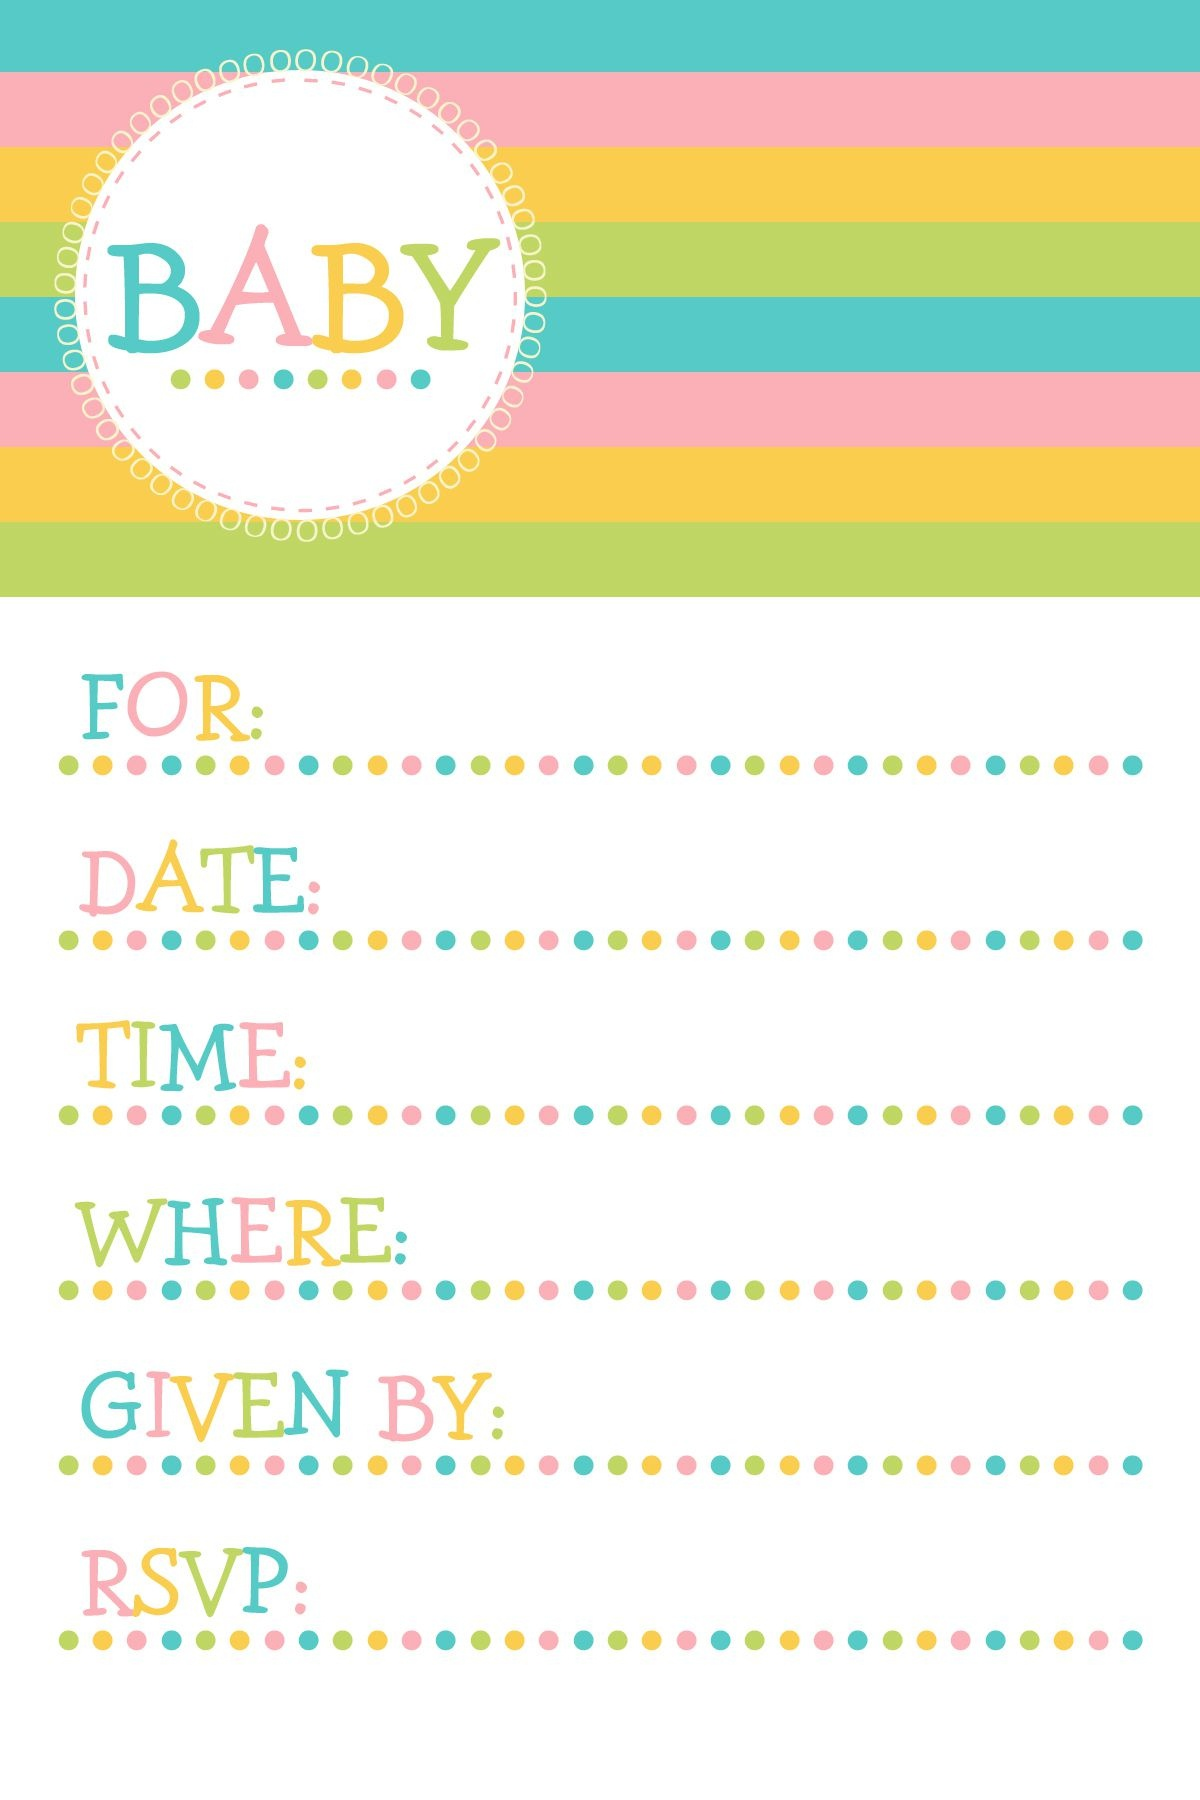 25 Adorable Free Printable Baby Shower Invitations - Free Printable Baby Shower Invitations Templates